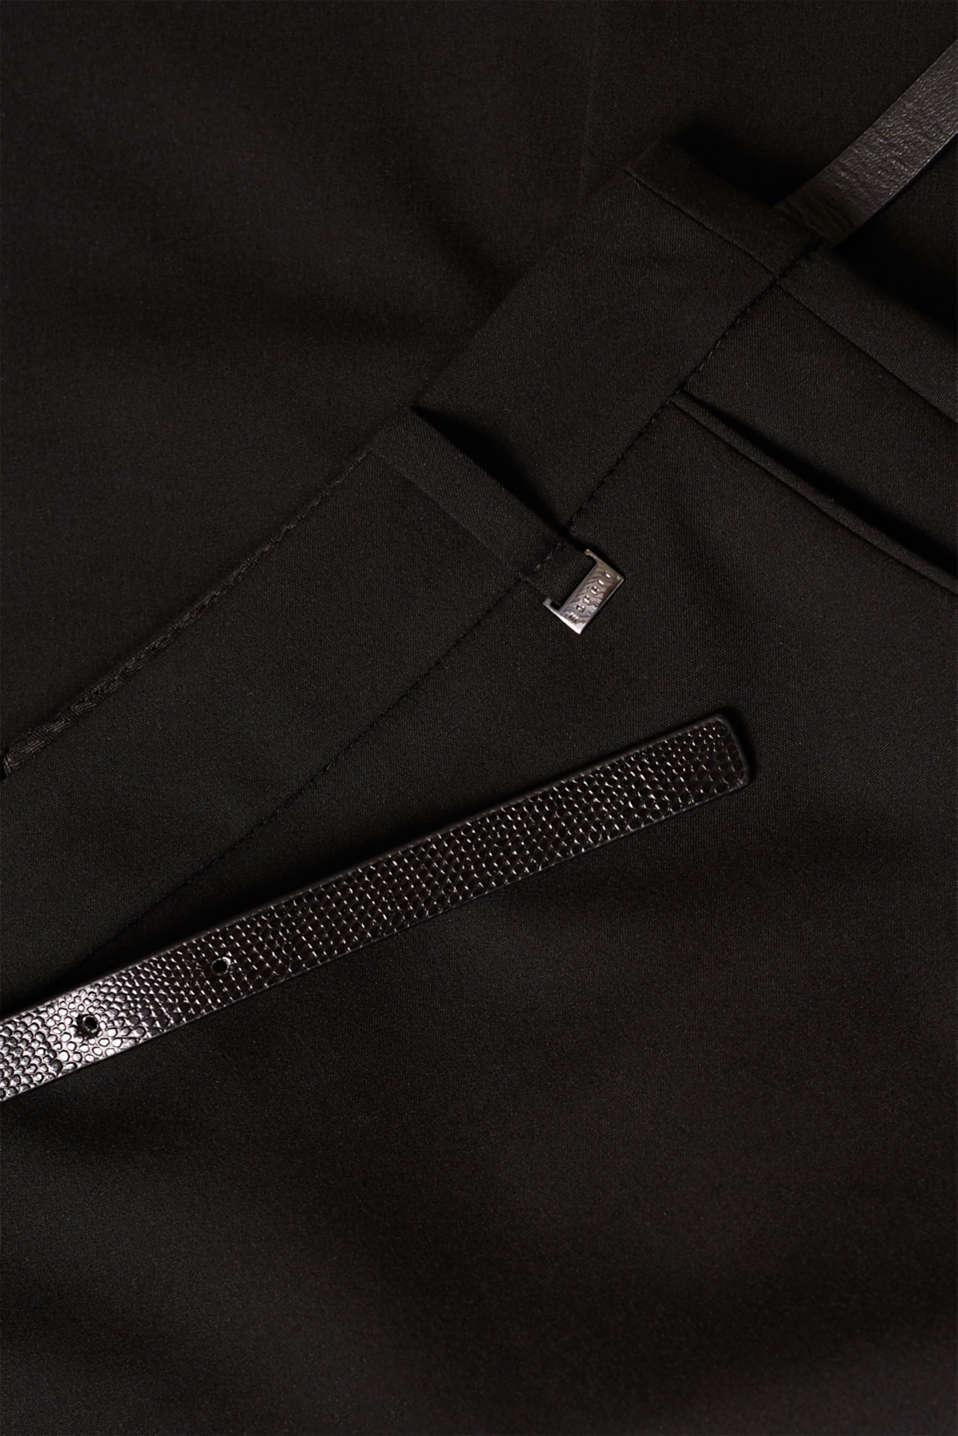 Pencil skirt with a belt + stretch for comfort, BLACK, detail image number 4